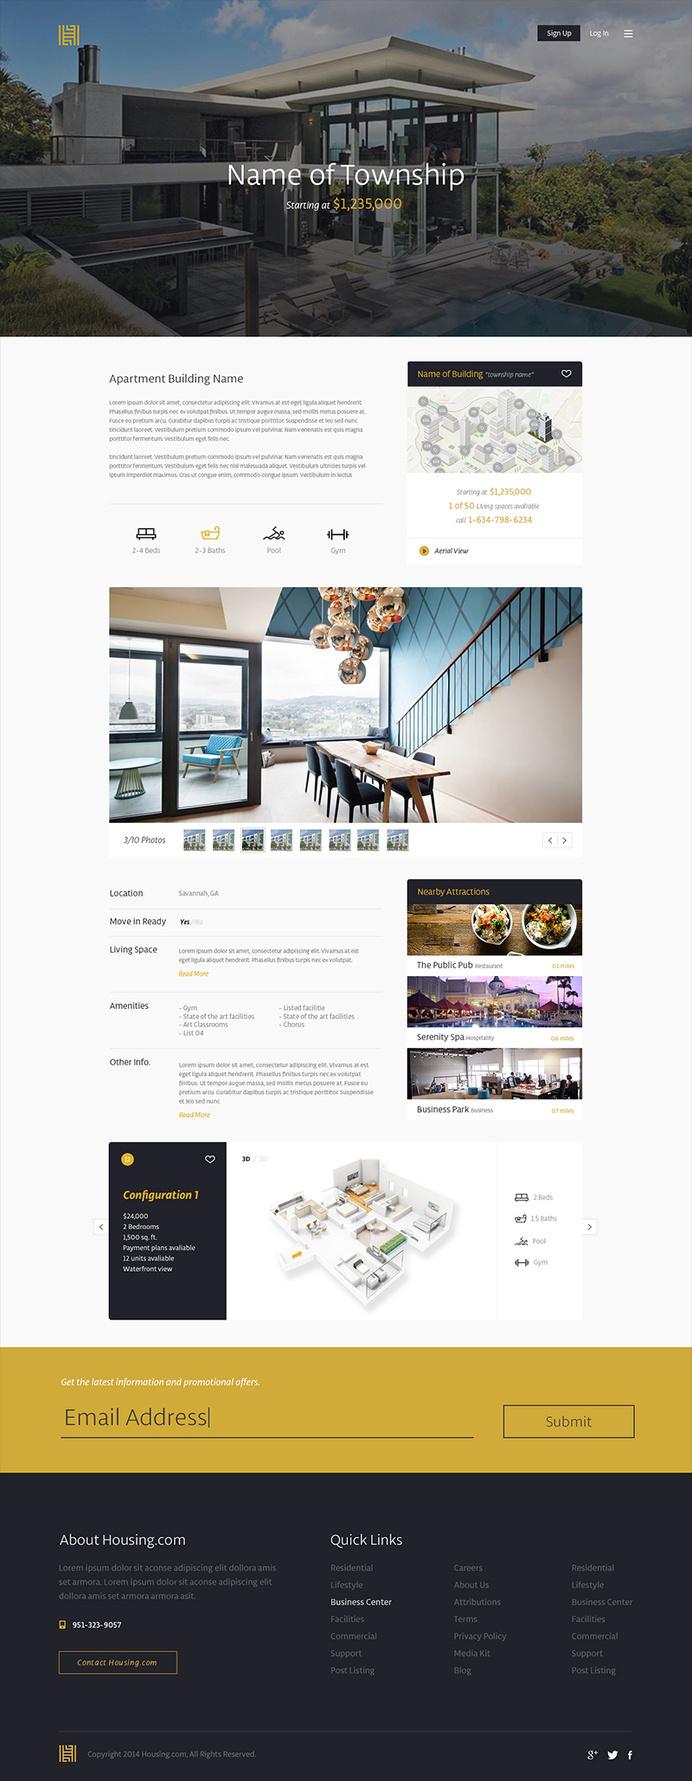 Housing.com #flat #house #focus #lab #design #clean #ui #township #real #minimalist #web #estate